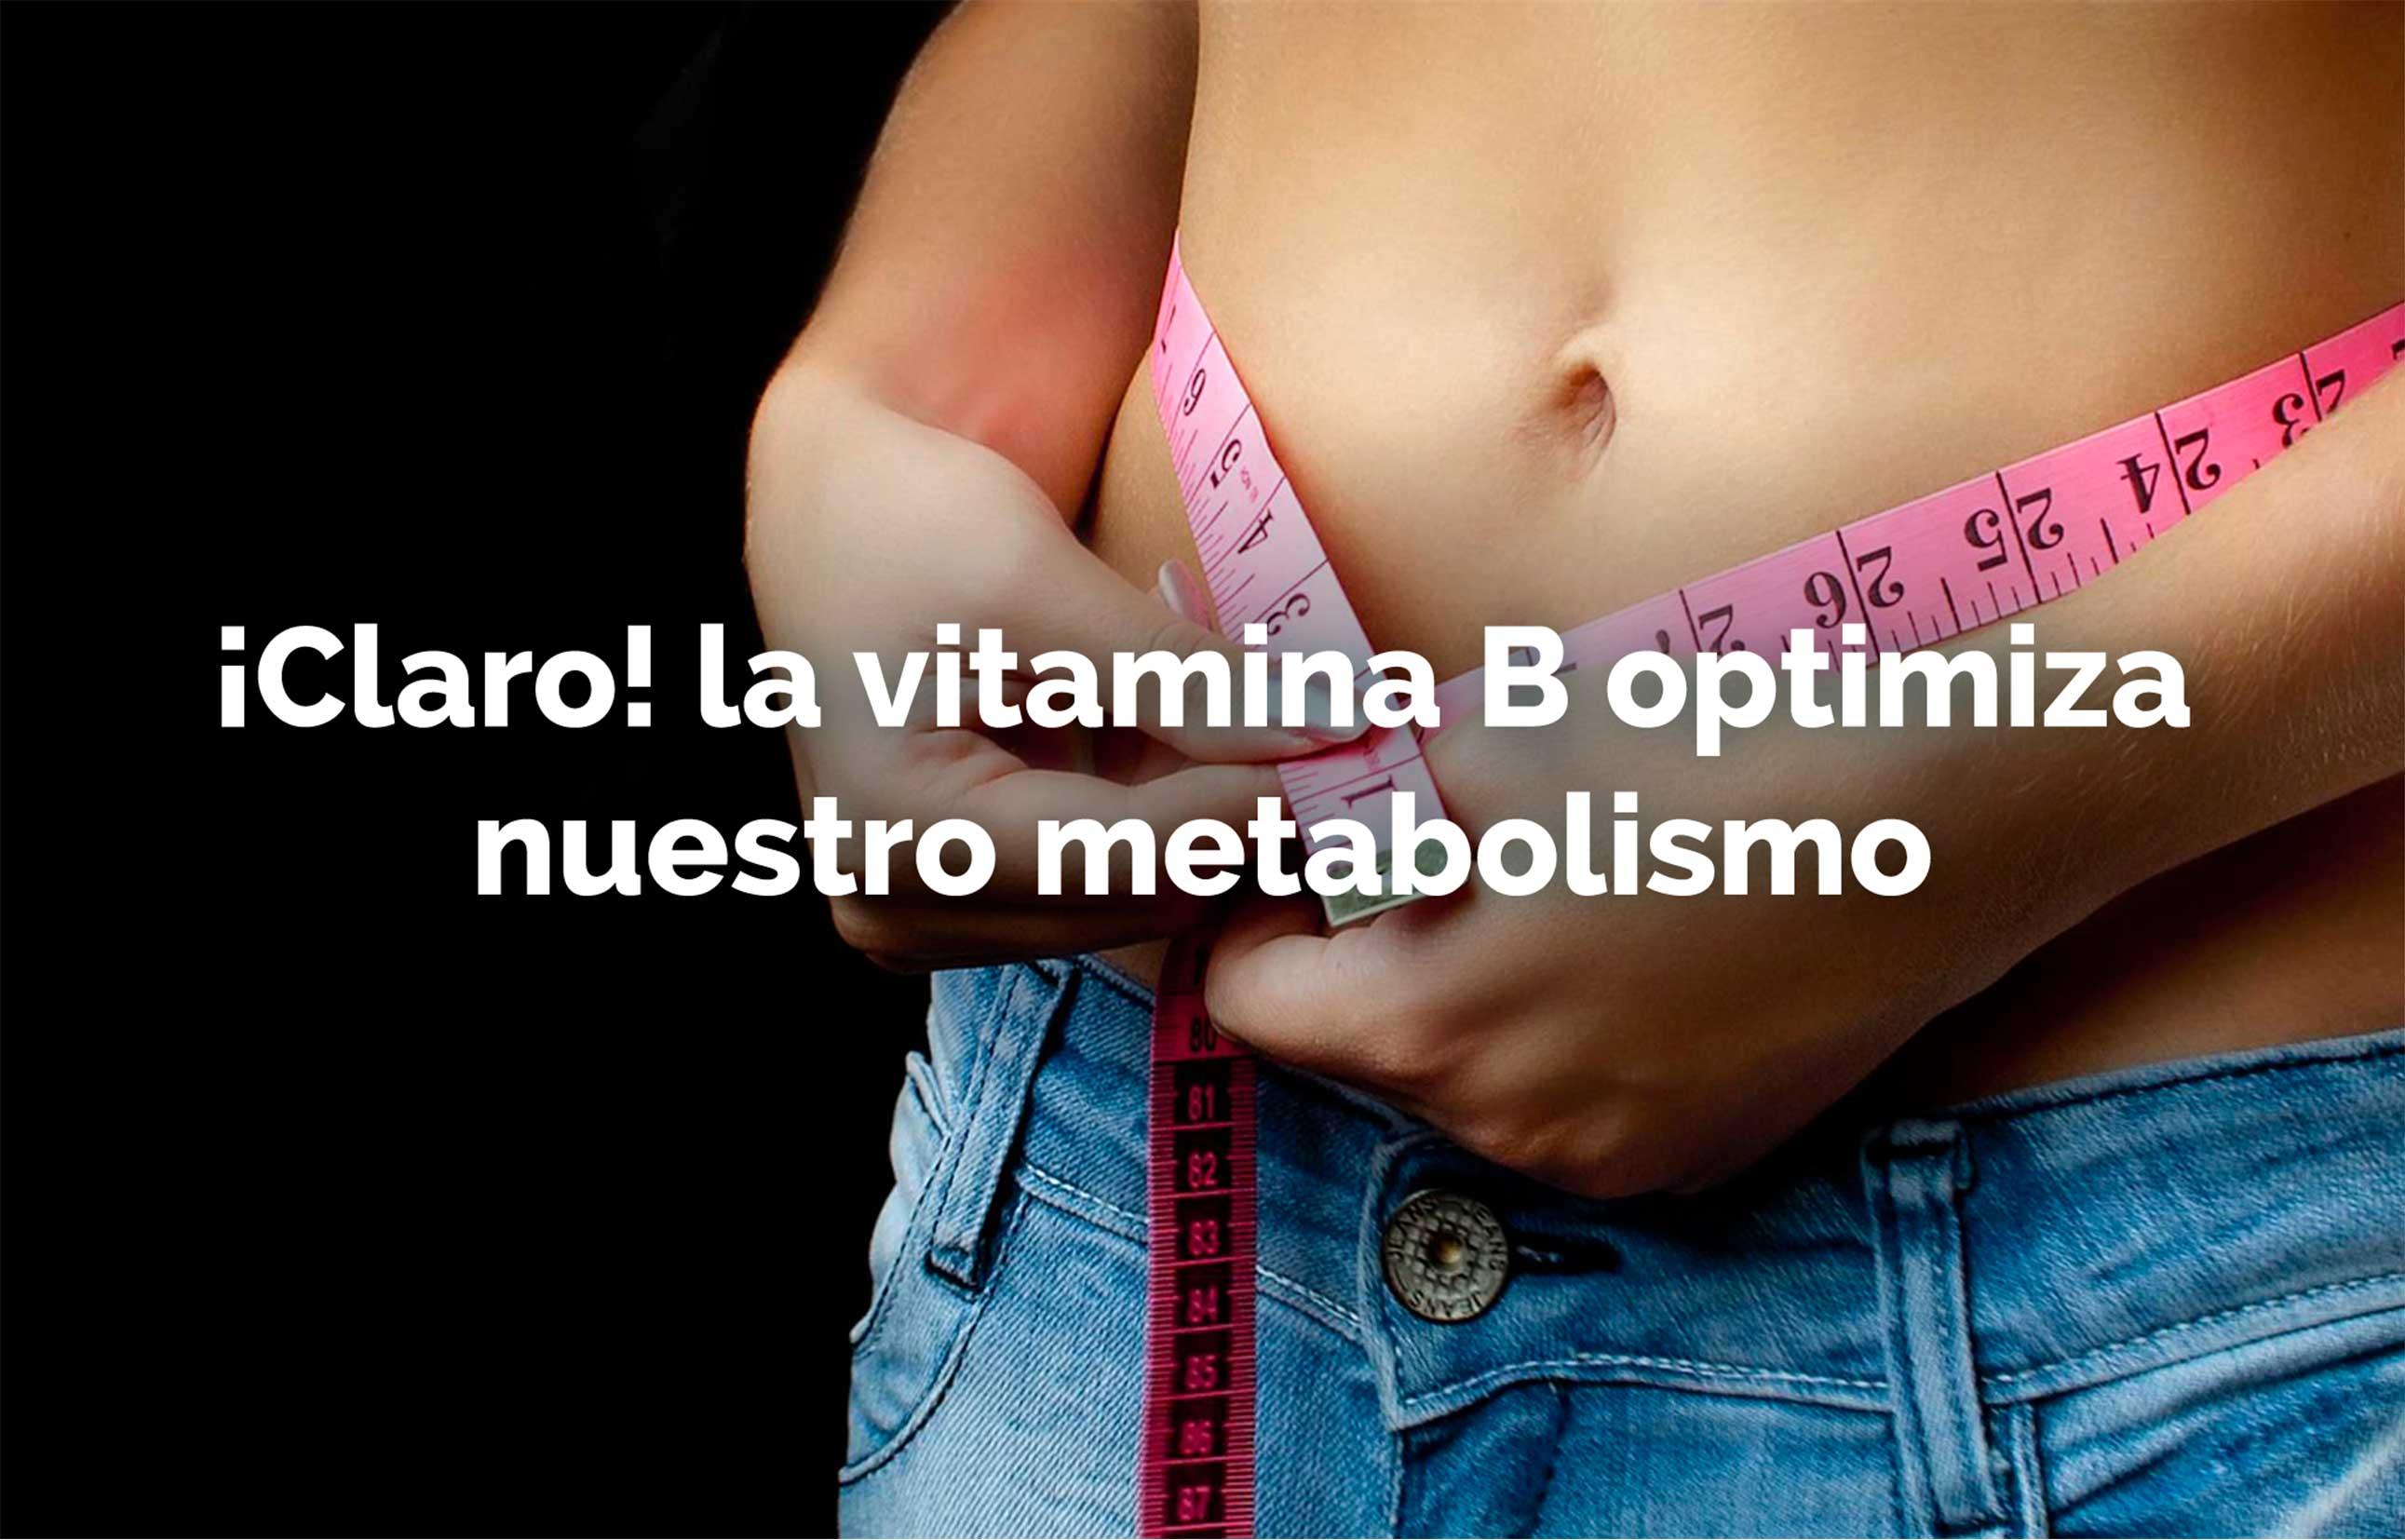 ¡Claro! la vitamina B optimiza nuestro metabolismo